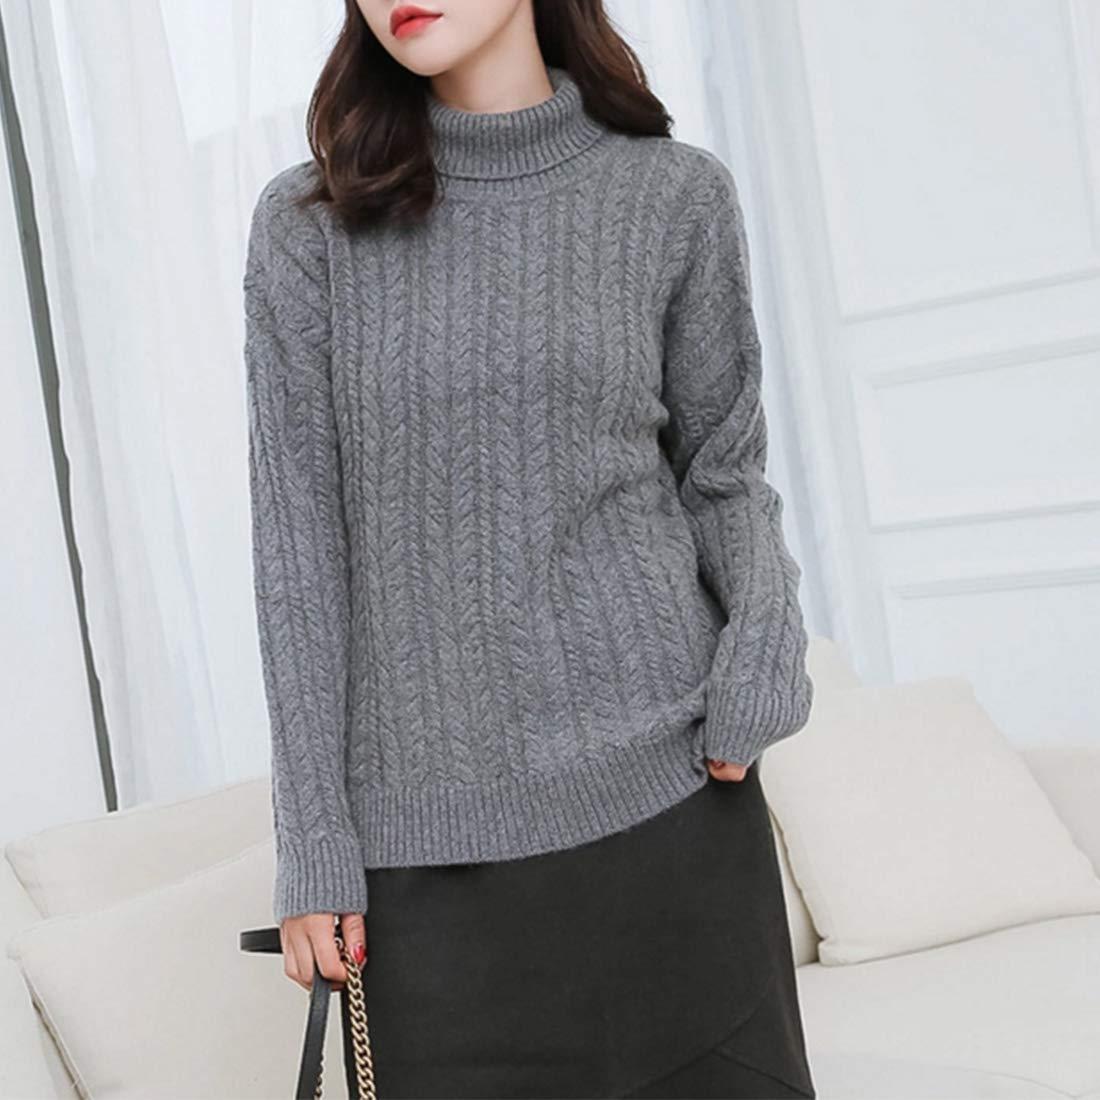 Color : Brown, Size : L Sugoishop Womens Cashmere Long Sleeve Turtleneck Sweater Keep Warm OL Feminine Size:M-XL